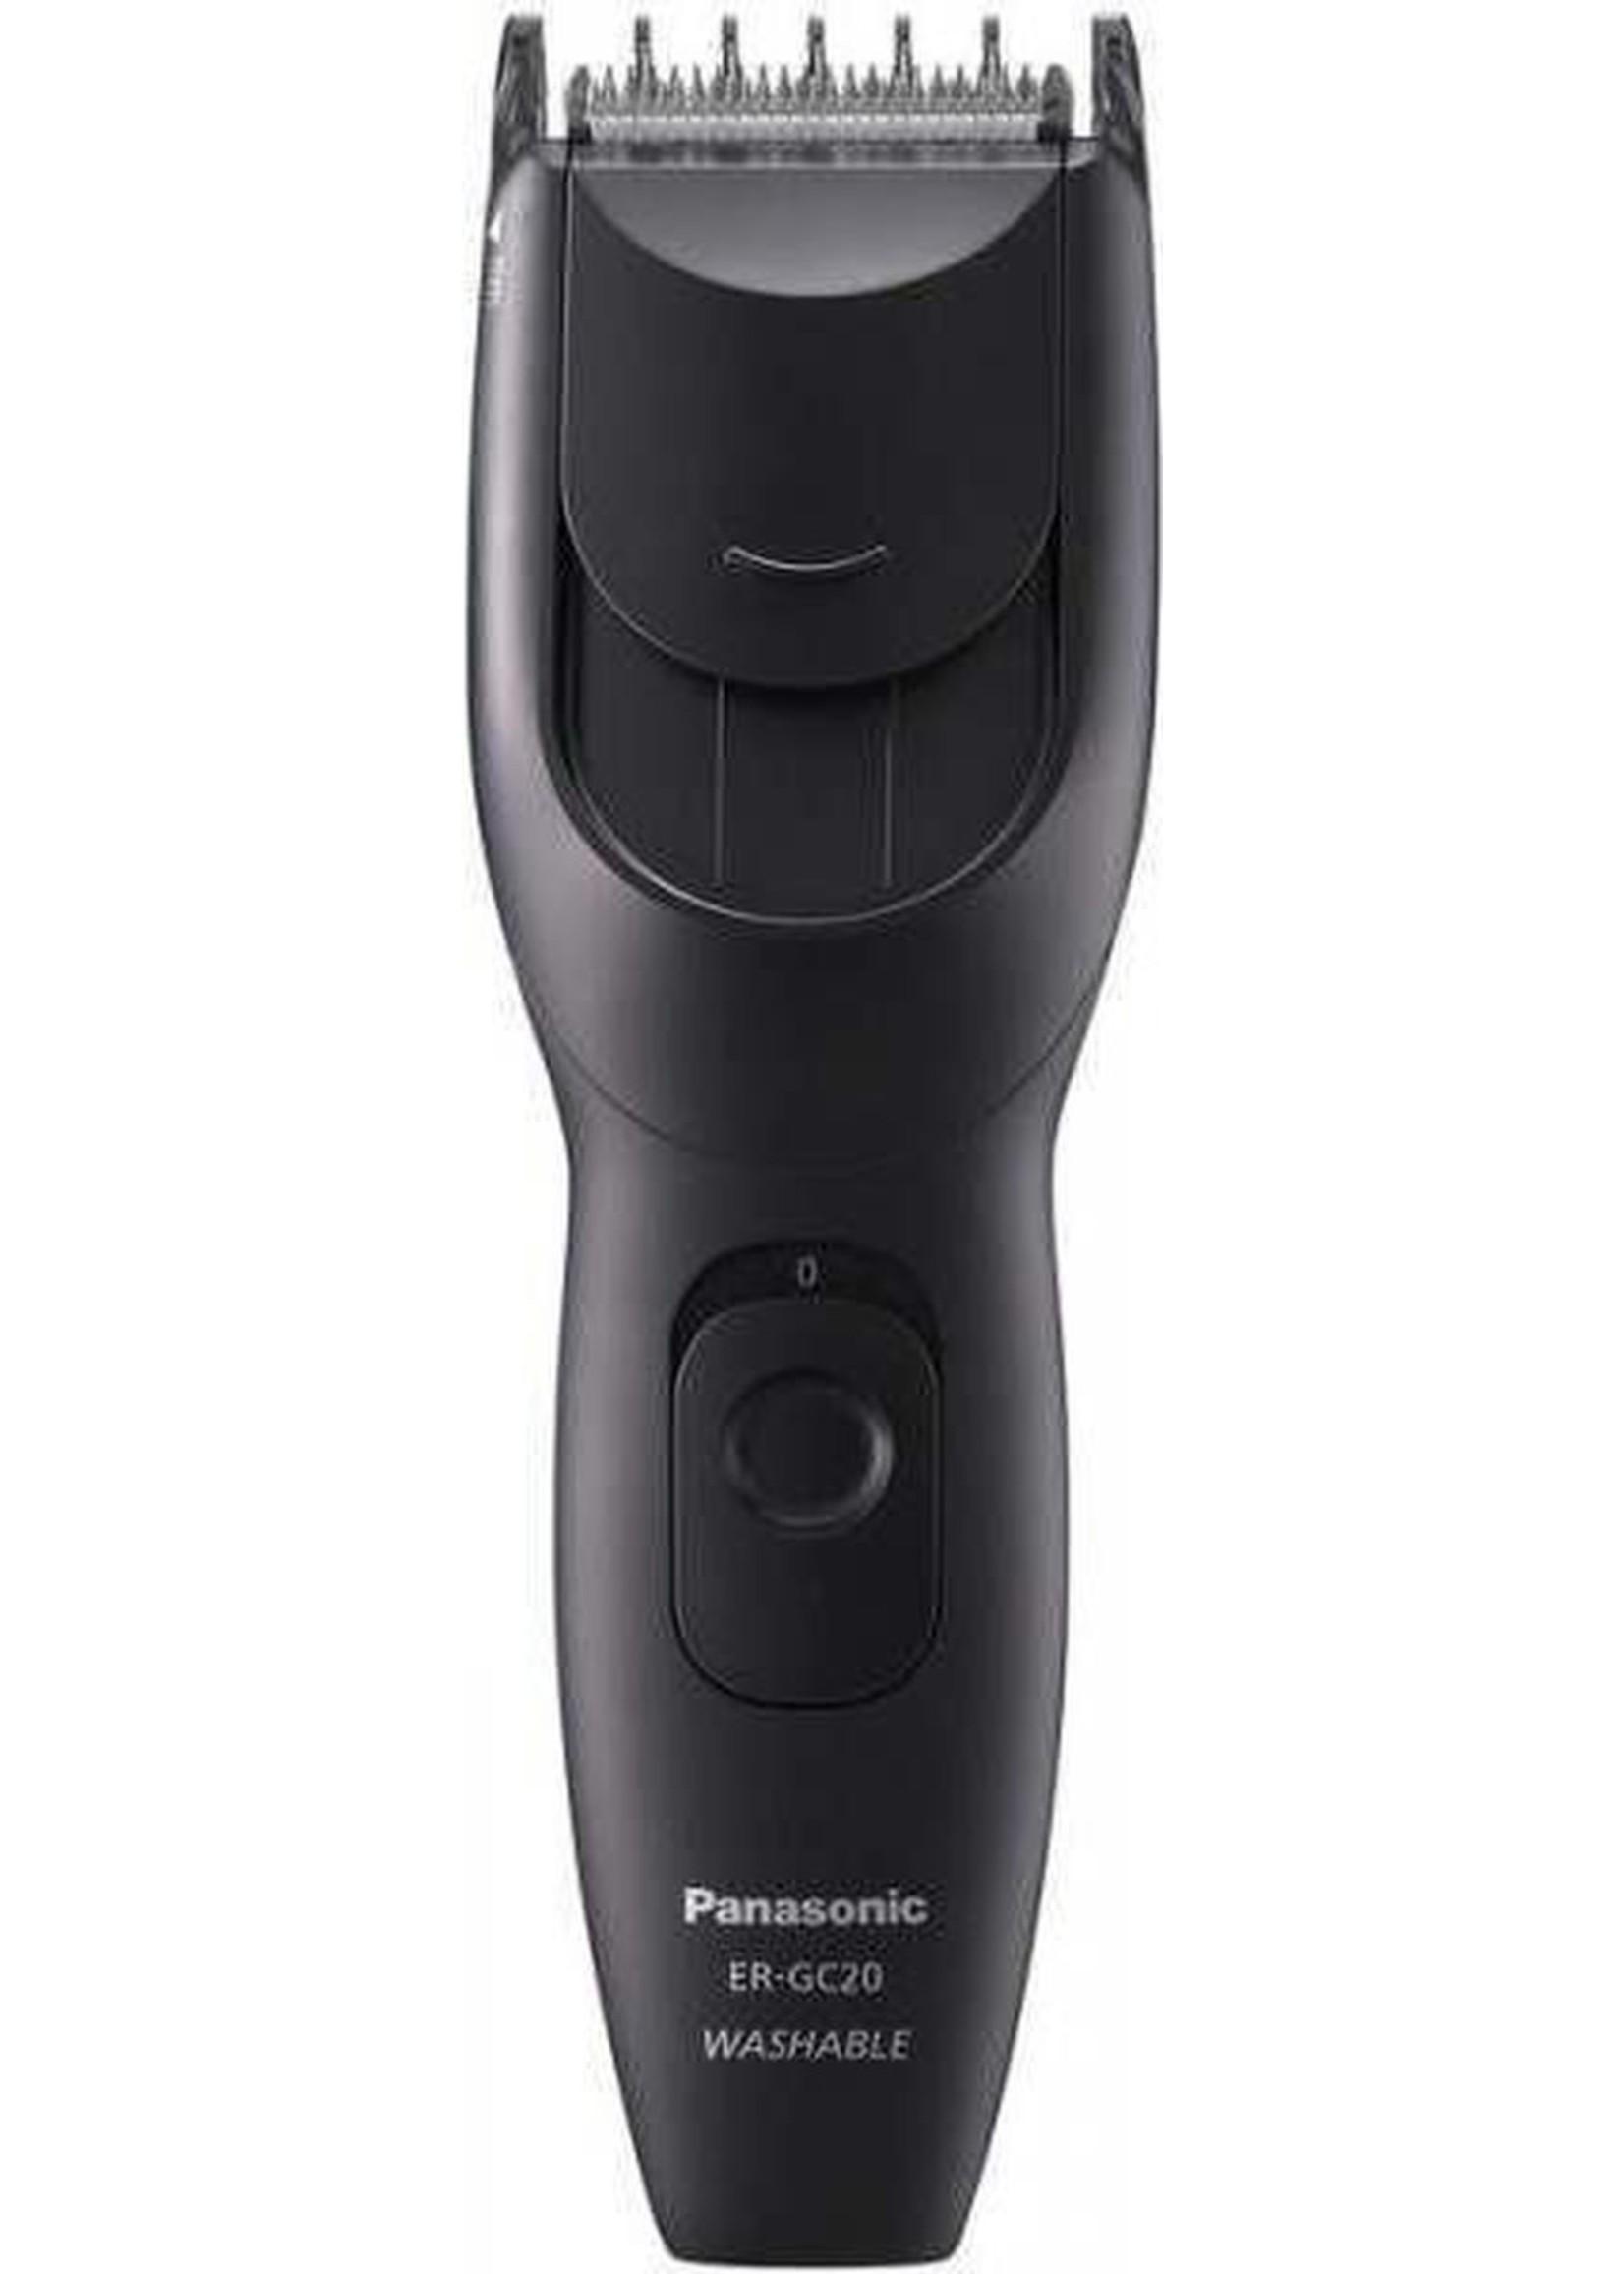 Panasonic Panasonic ER-GC20-K503 Tondeuse